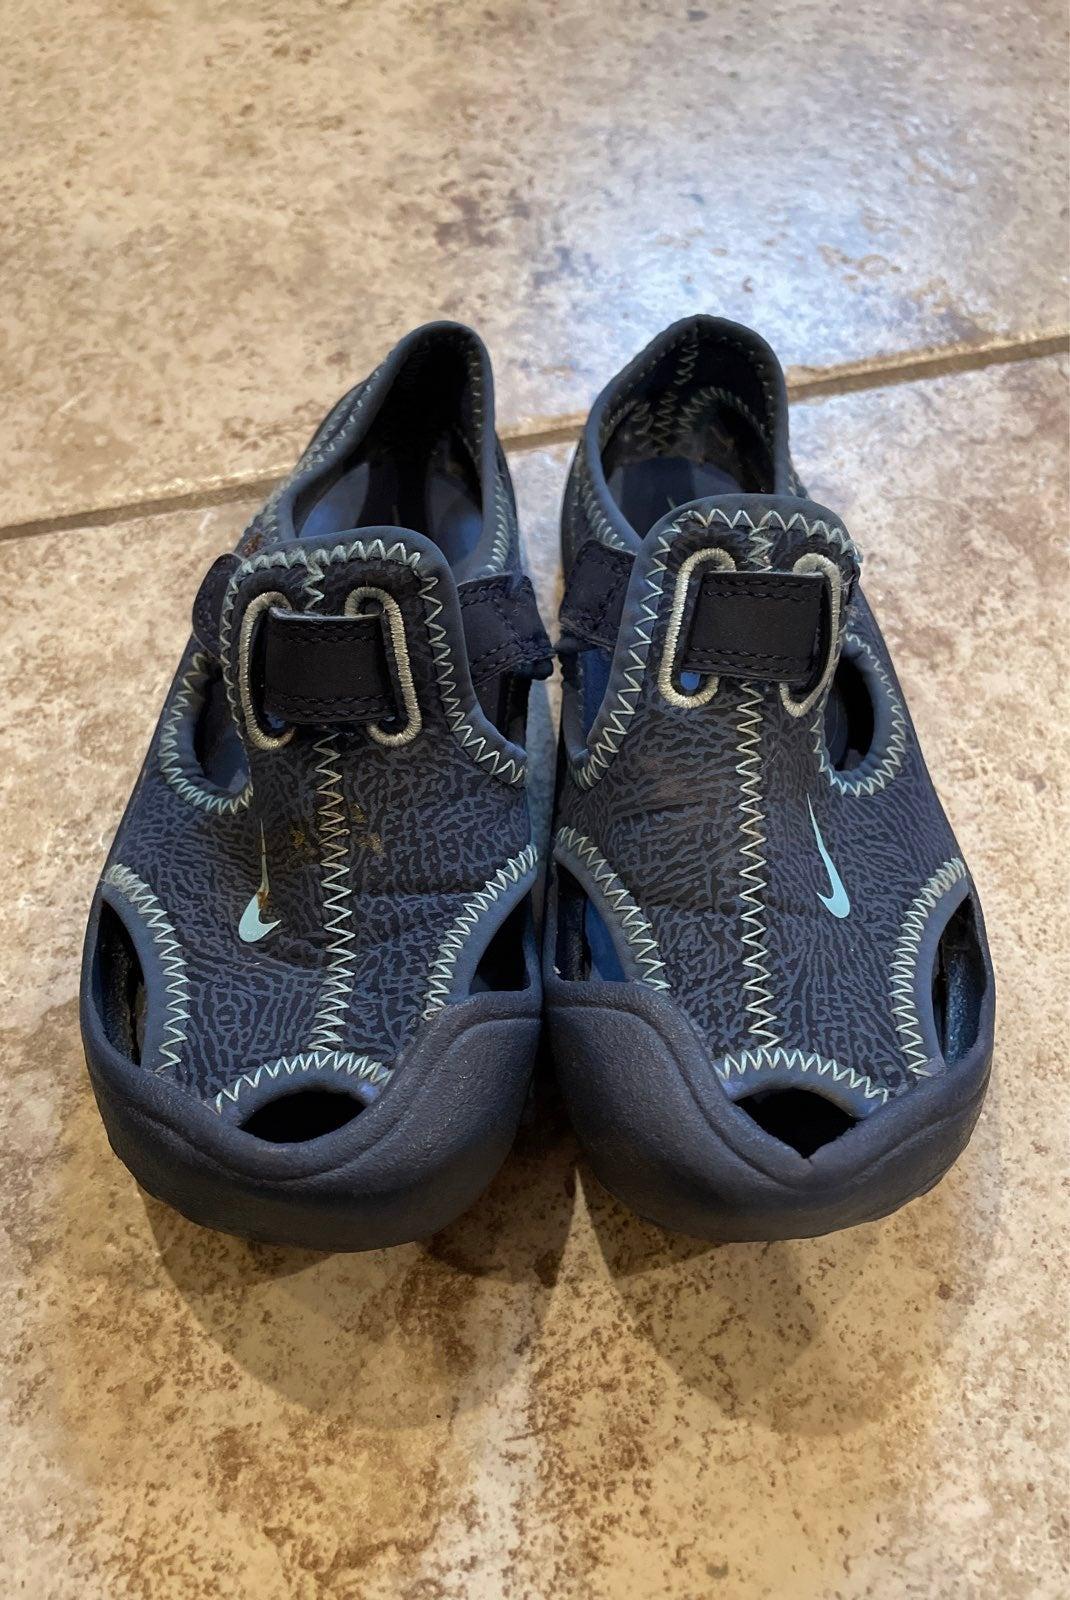 Nike toddler water shoes